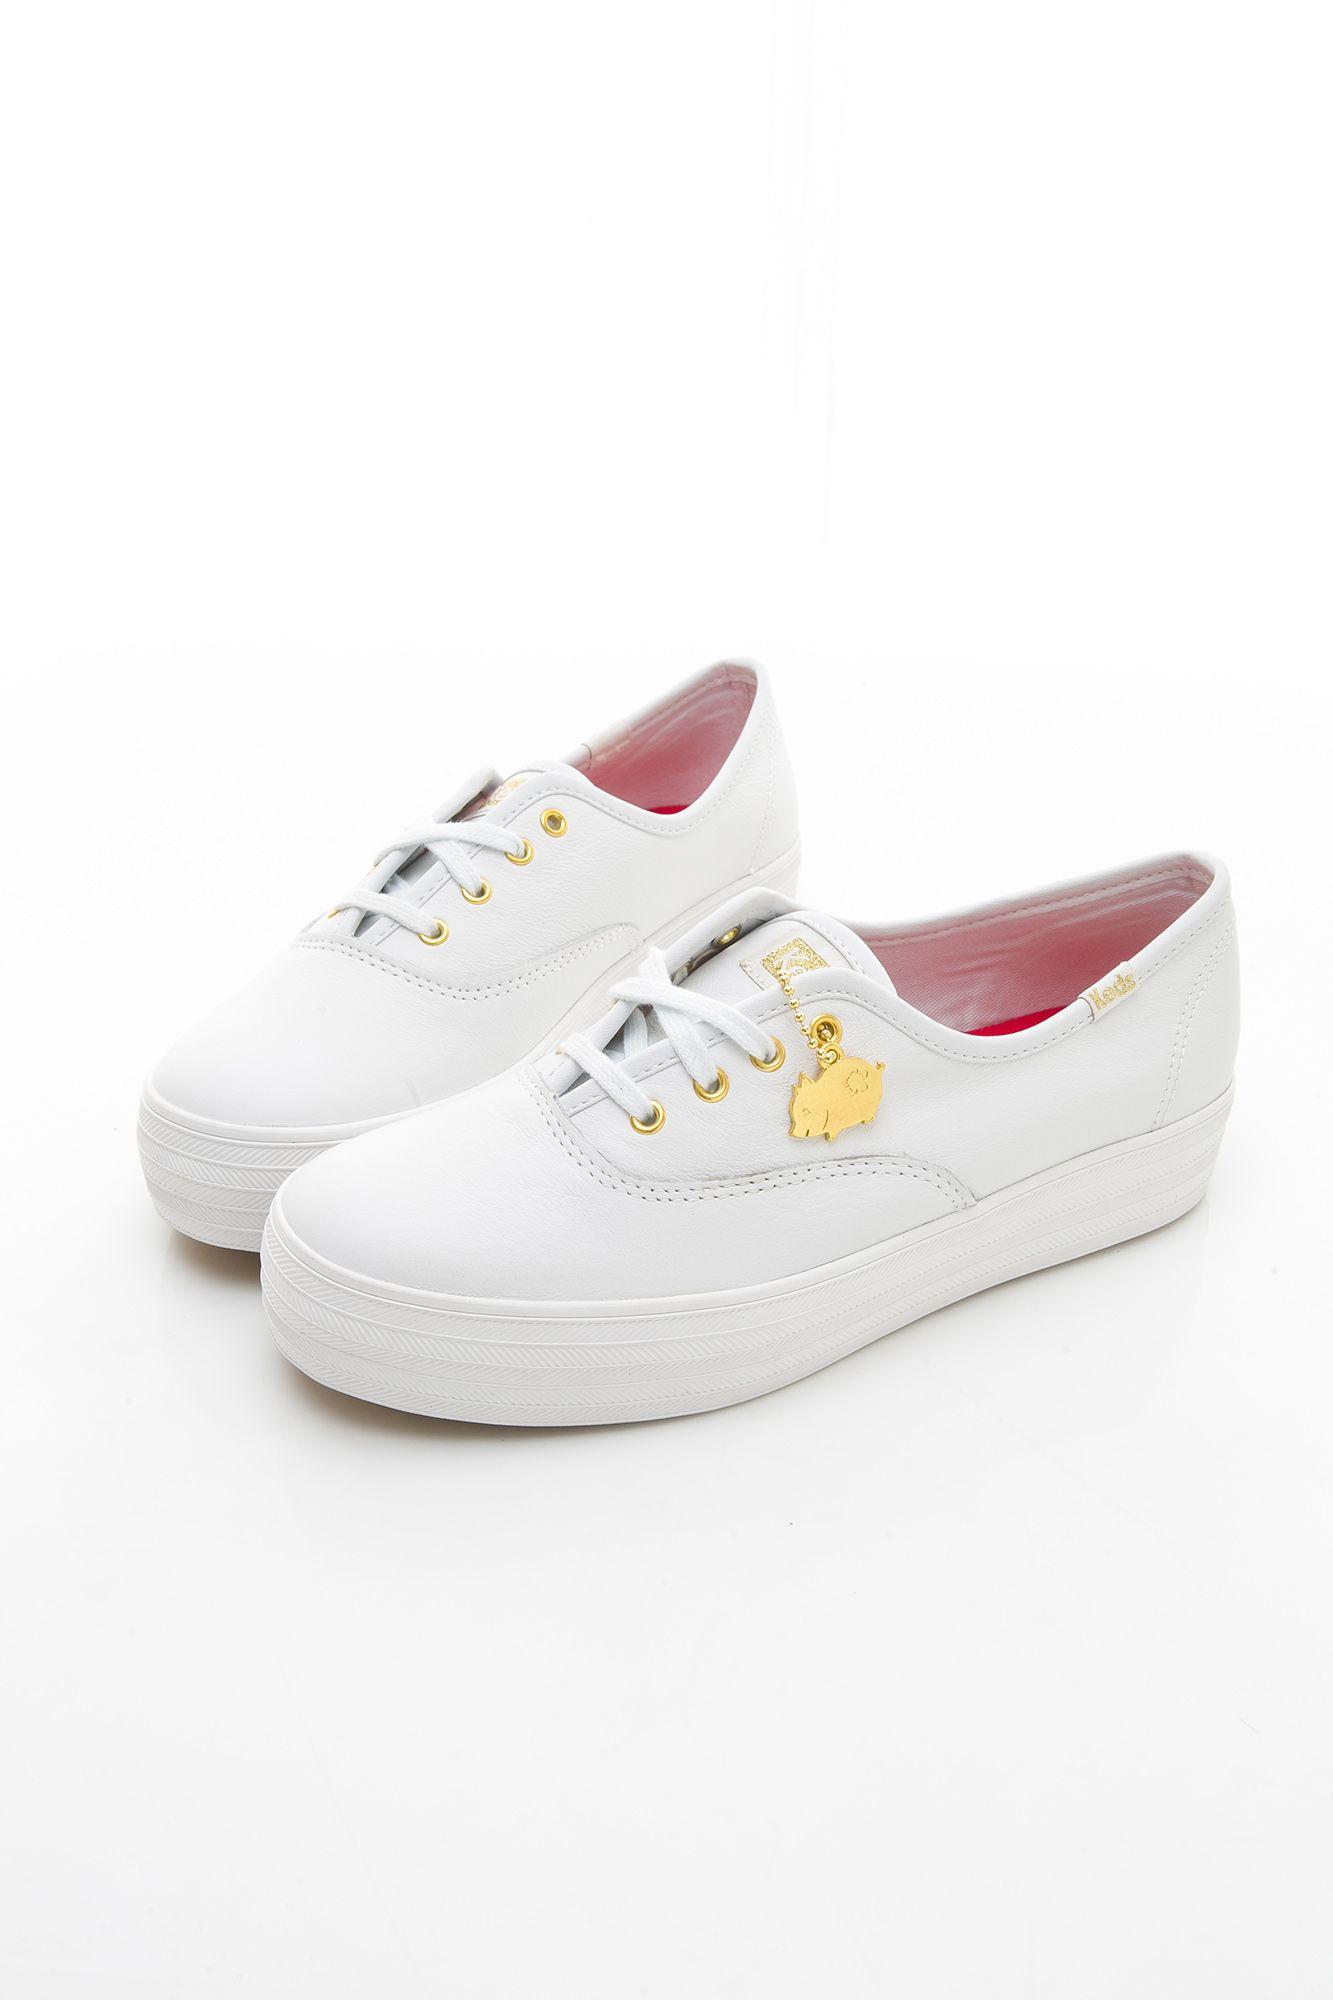 Keds, 休閒鞋, 休閒鞋推薦, 帆布鞋, 限定鞋款, 鞋款推薦